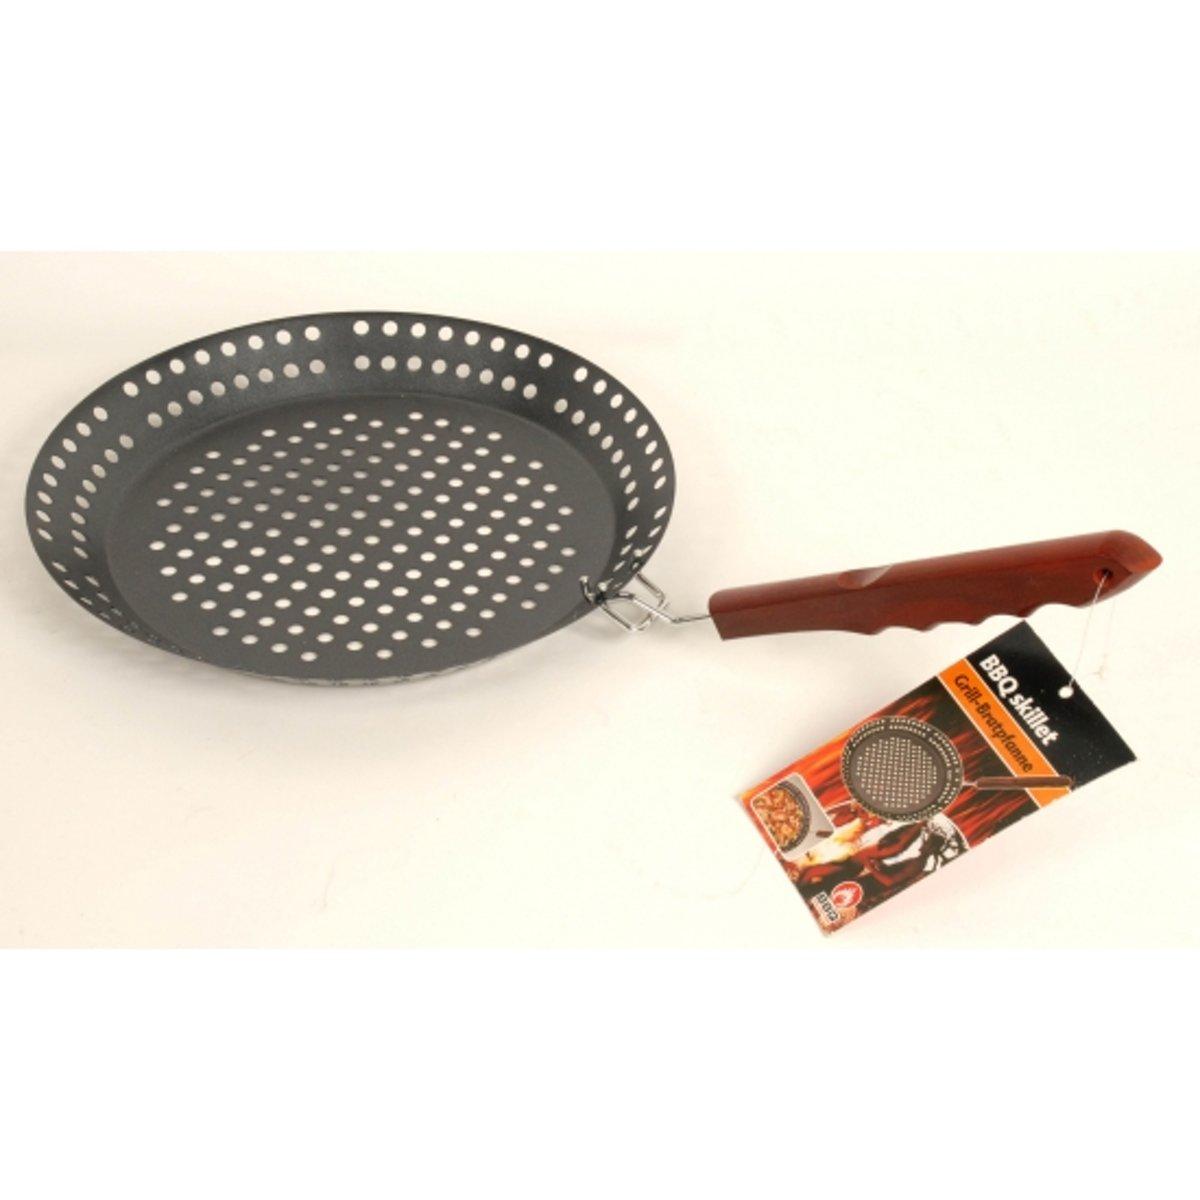 Barbecue pan 32 cm kopen